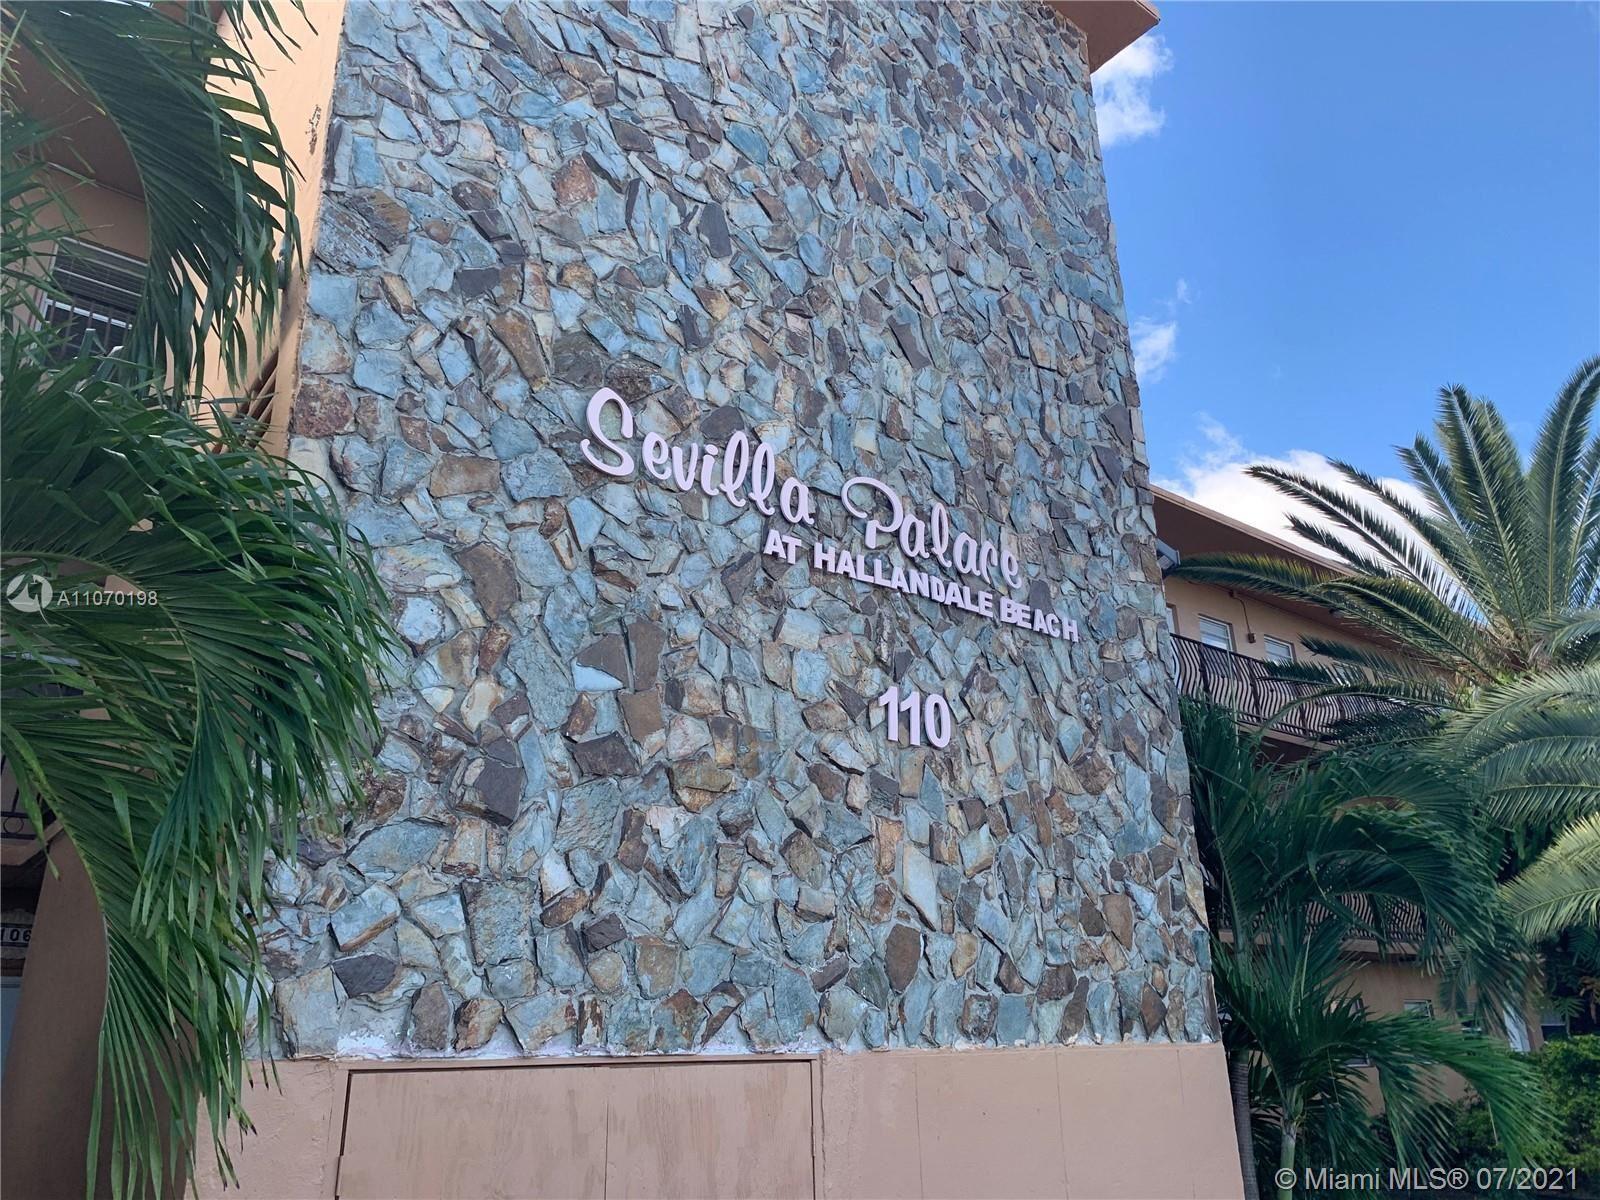 110 SE 2nd St #308, Hallandale Beach, FL 33009 - #: A11070198